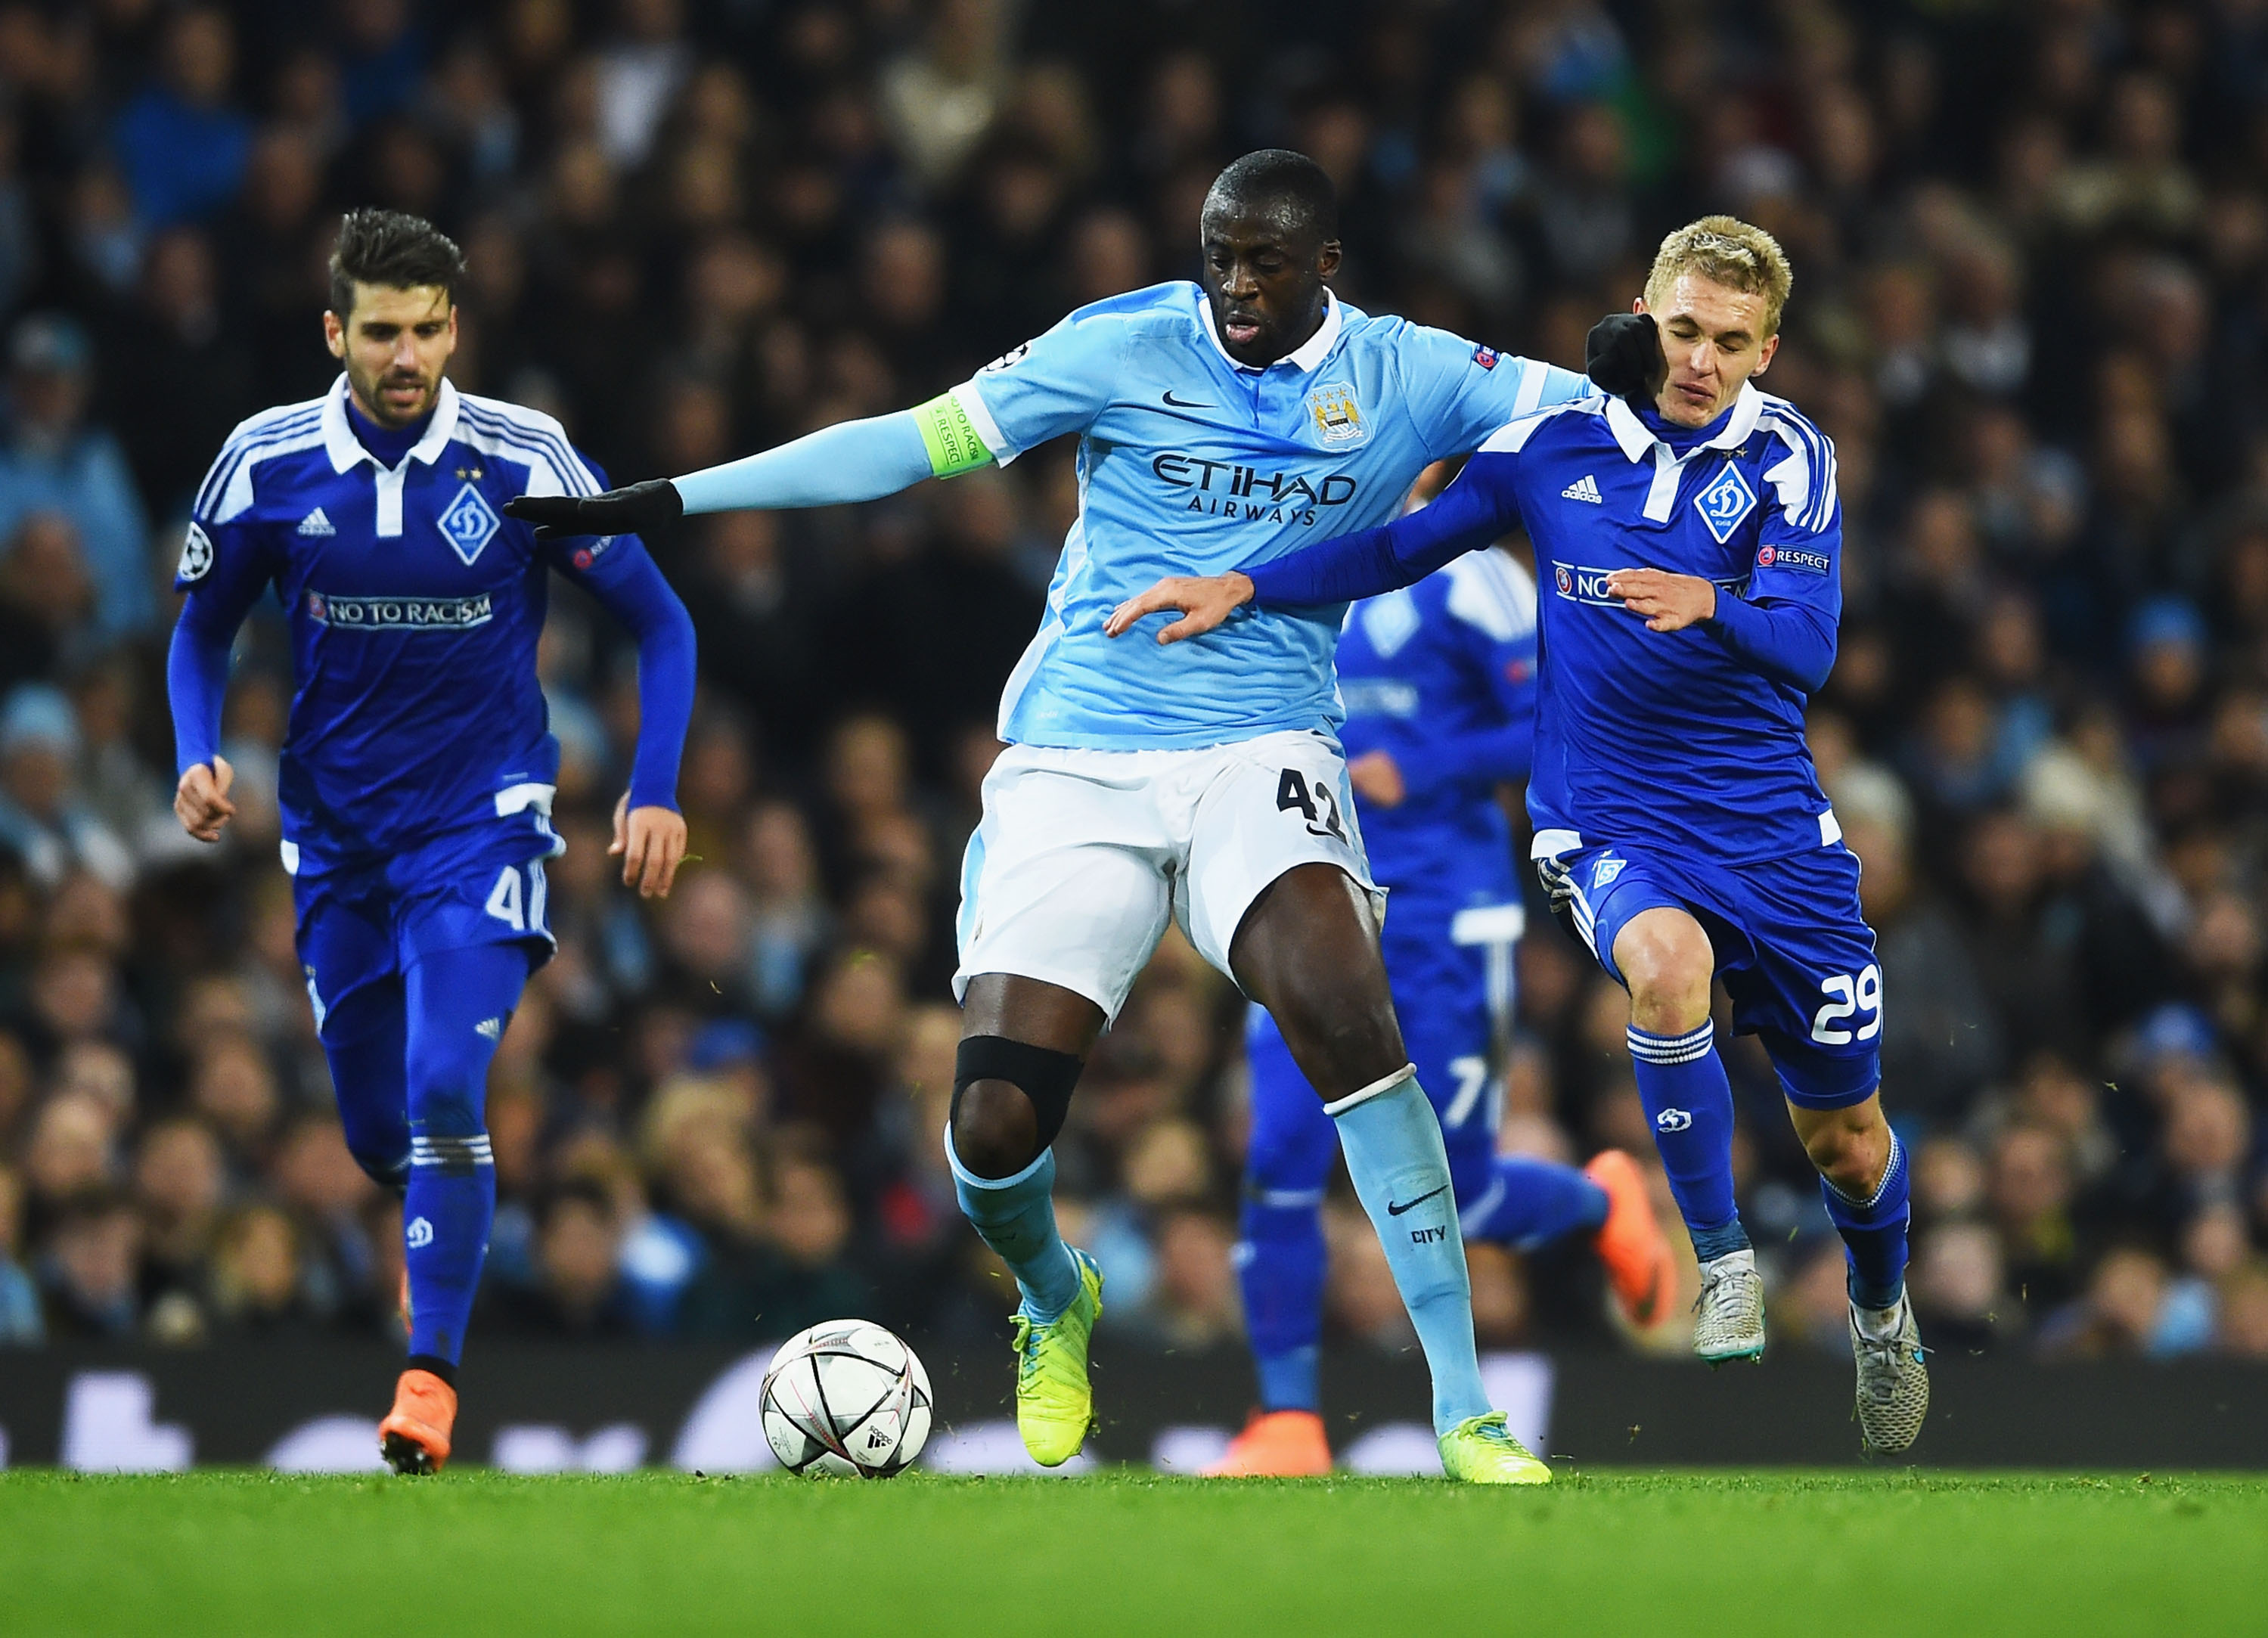 Yaya Touré difende palla dalla pressione di Buyalskiy